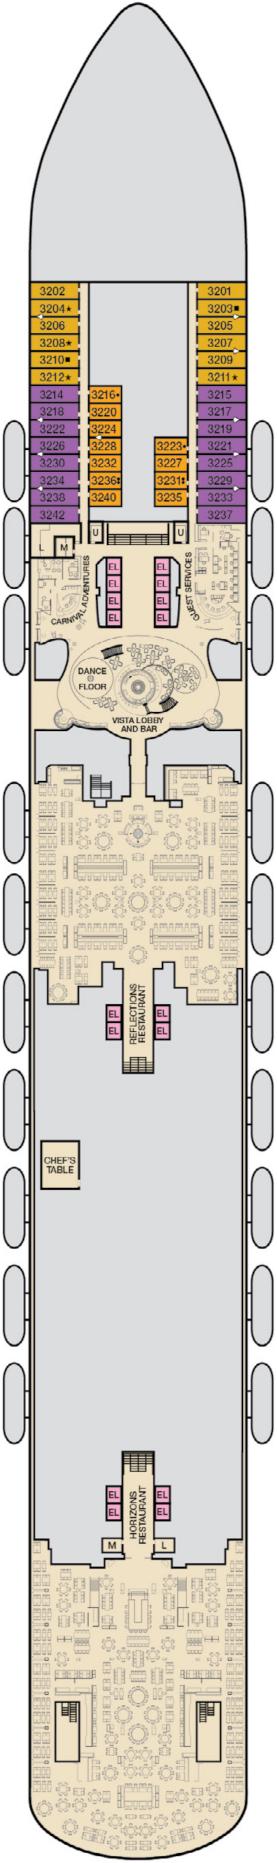 Carnival Vista Lobby Deck Plan